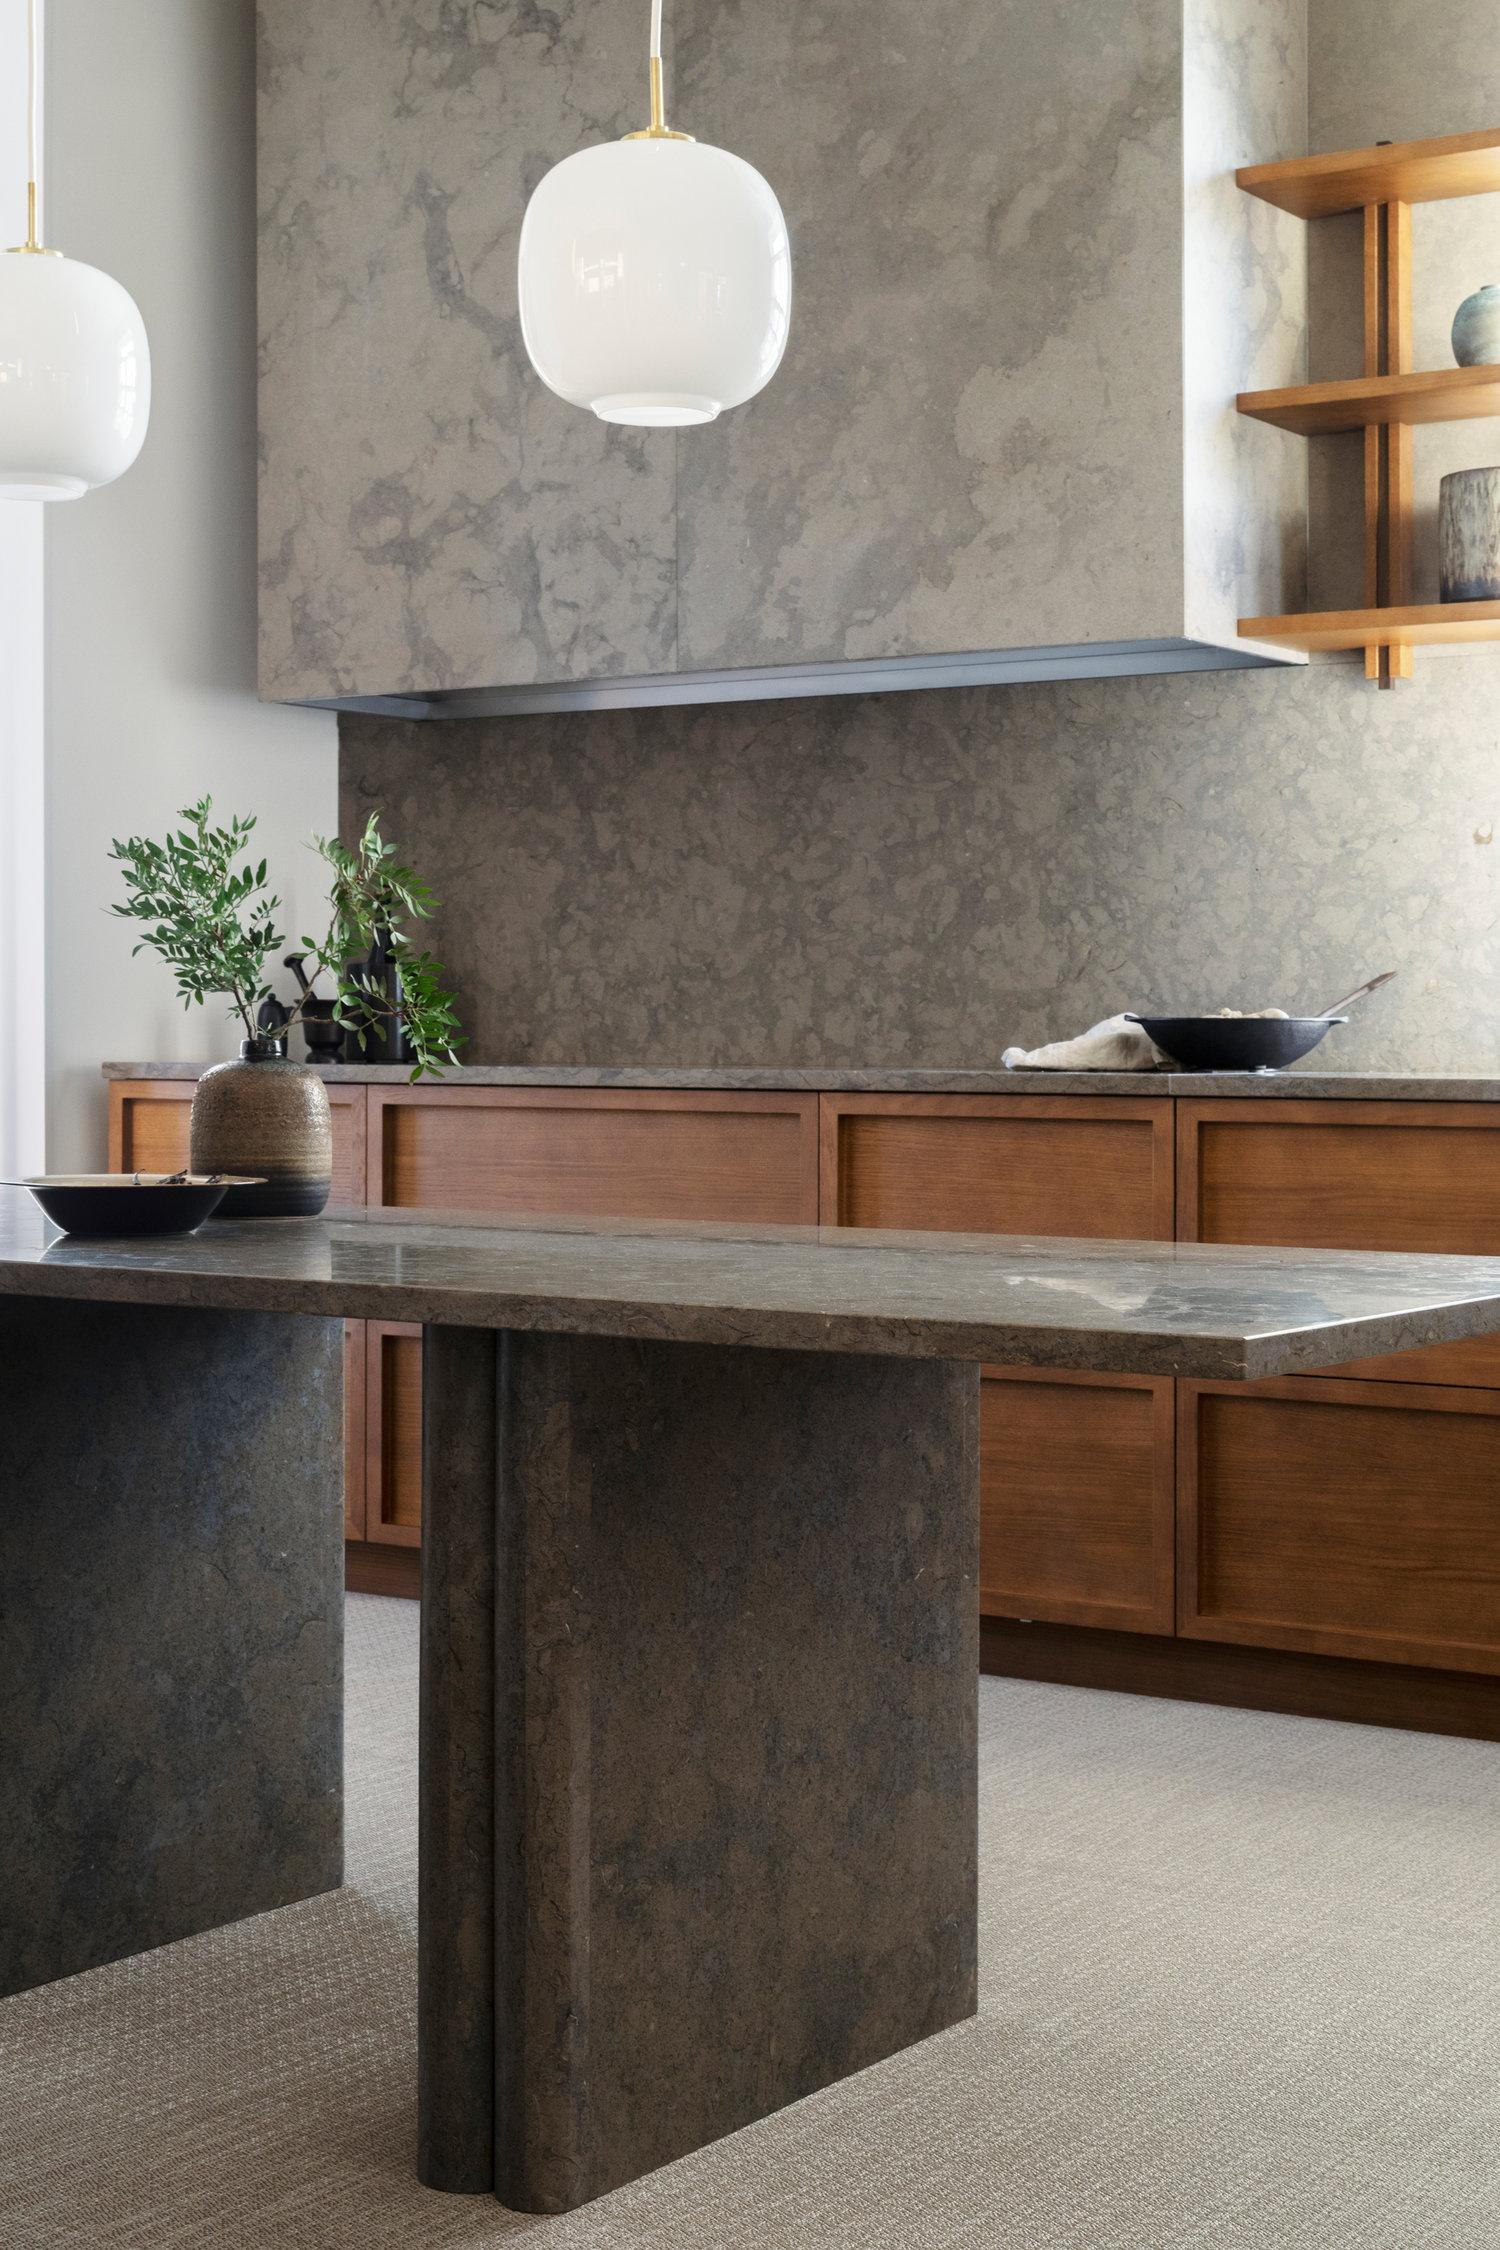 LILJENCRANTZ FOR KVÄNUM |  Designer Louise Liljencrantz has teamed up with Swedish company Kvänum creating three contemporary kitchens with an overarching emphasis on: warmth, detail and simplicity | image via Kvänum    LINK HERE >>>